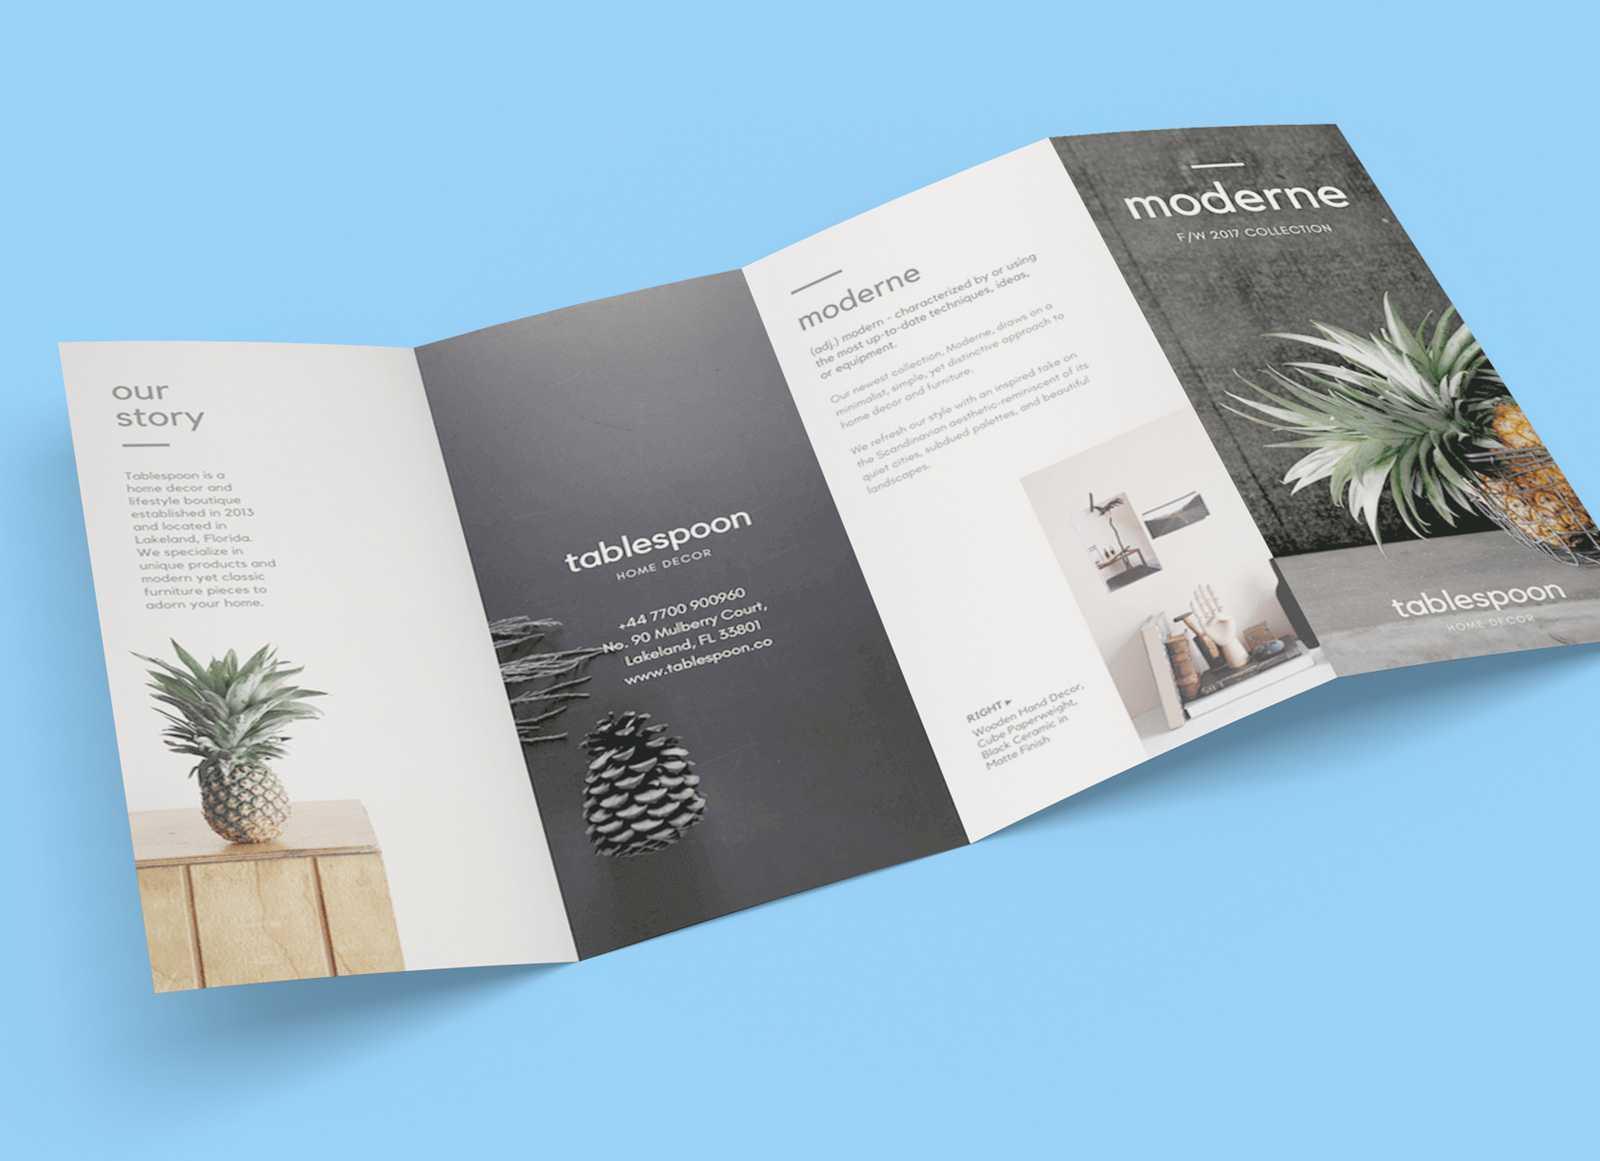 Free 4 Panel Quad Fold Brochure Mockup Psd - Good Mockups For Brochure 4 Fold Template